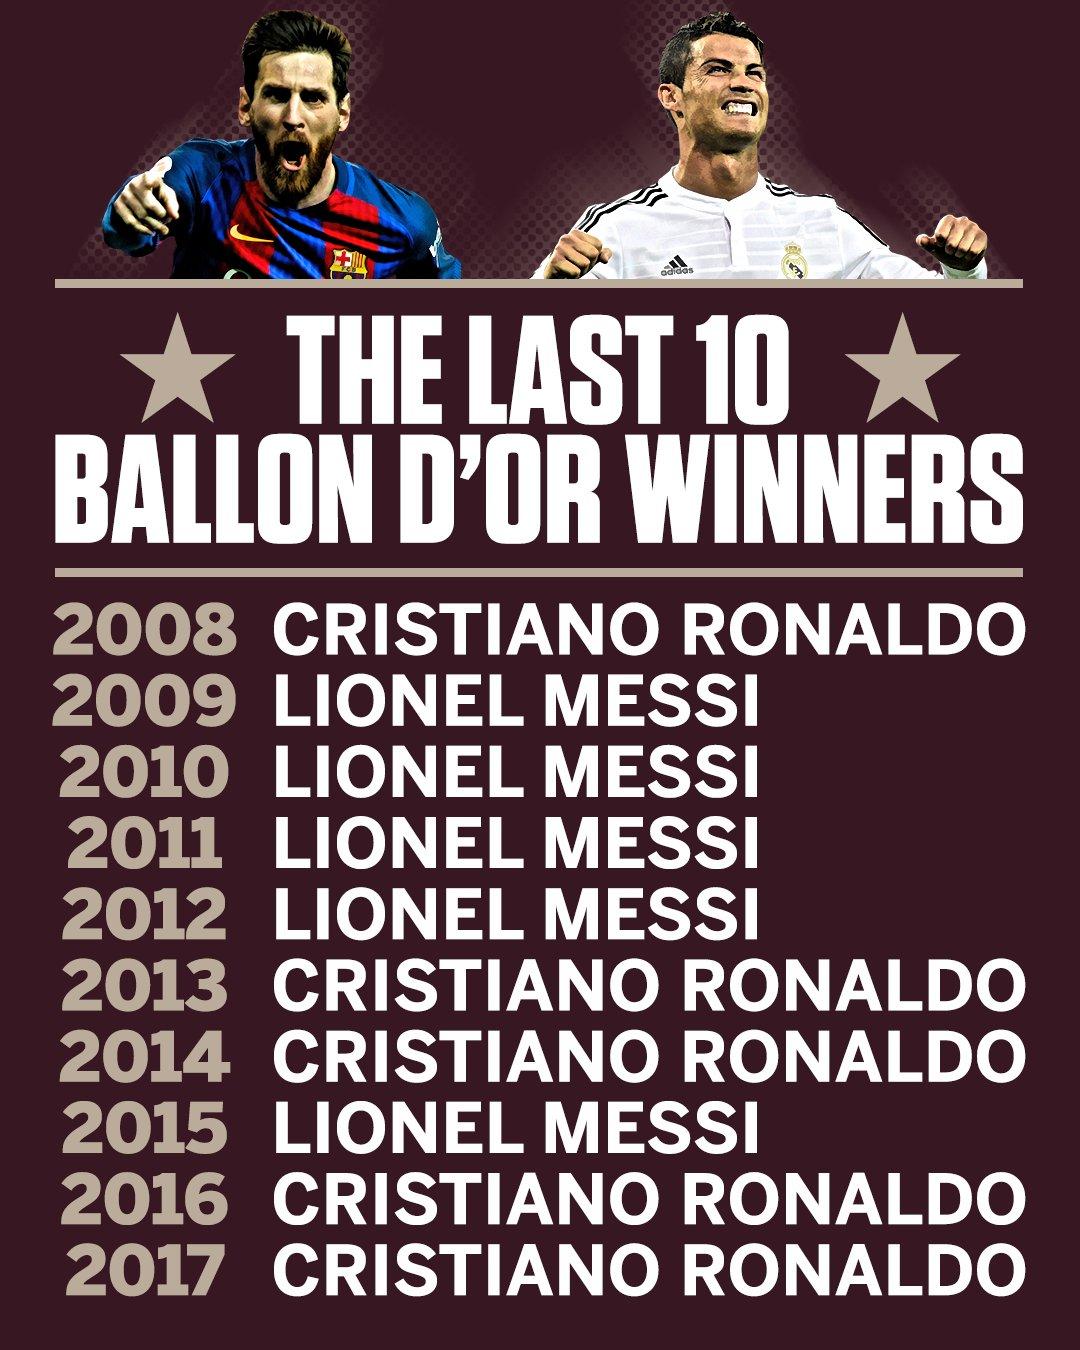 The list of the last 10 Ballon d'Or winners is a short one. (via @ESPNFC) https://t.co/8DOtSJ8d1h